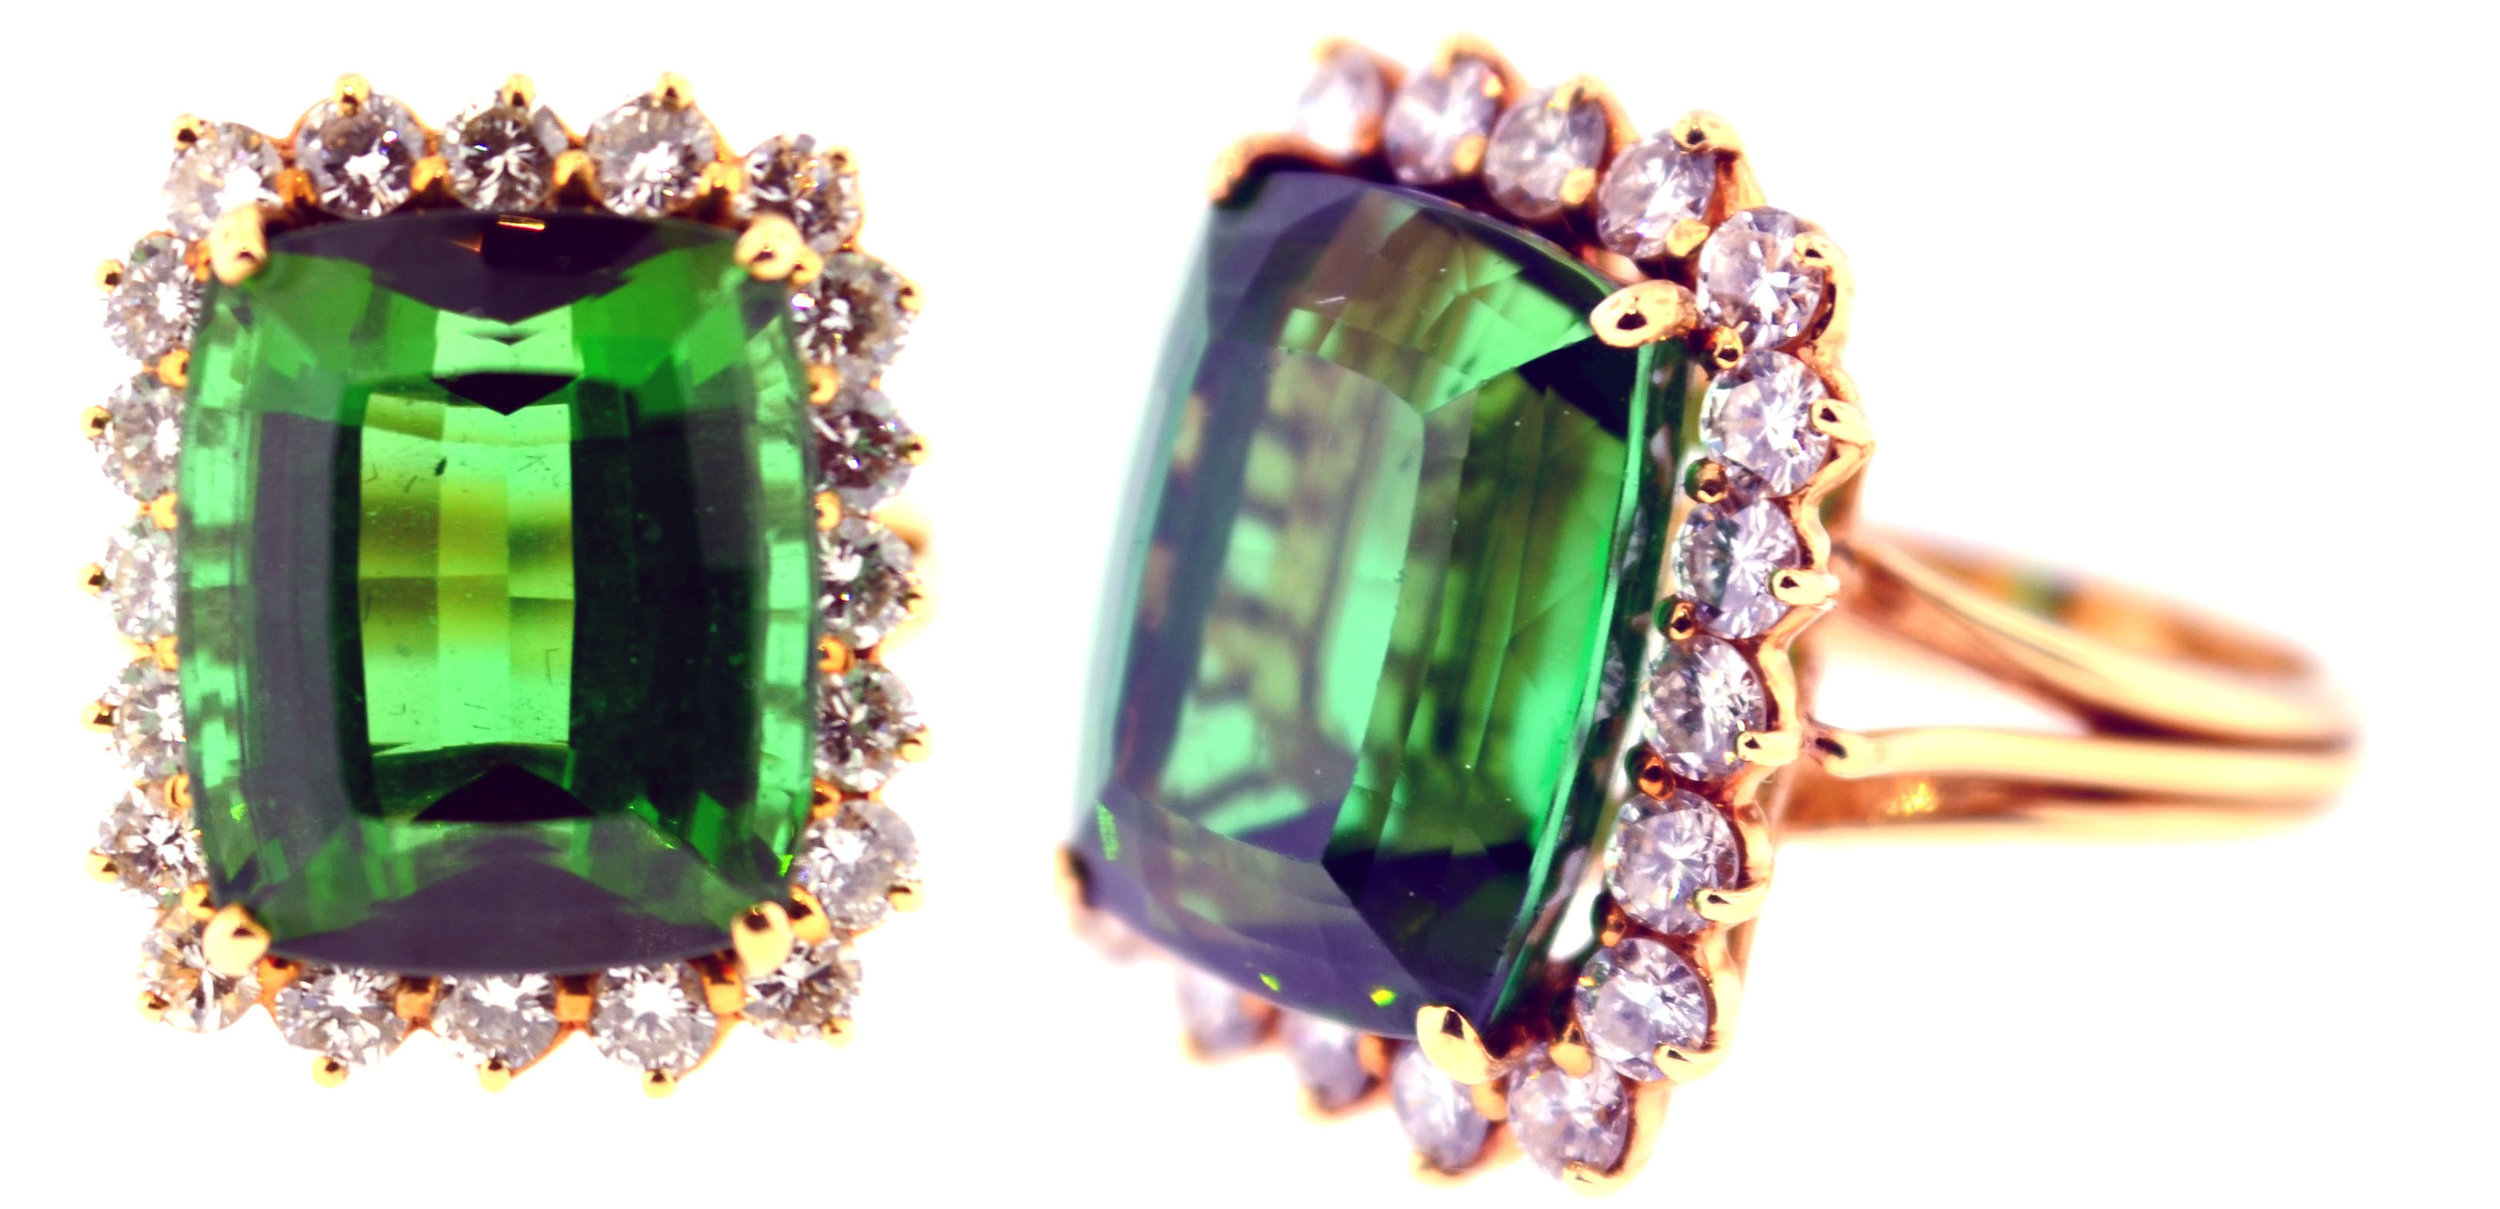 MSP43, 14 karat yellow gold mounting, set with a 14.5 carat green tourmaline, surrounded by 1.05 carats of diamonds. Retro, circa 1970.